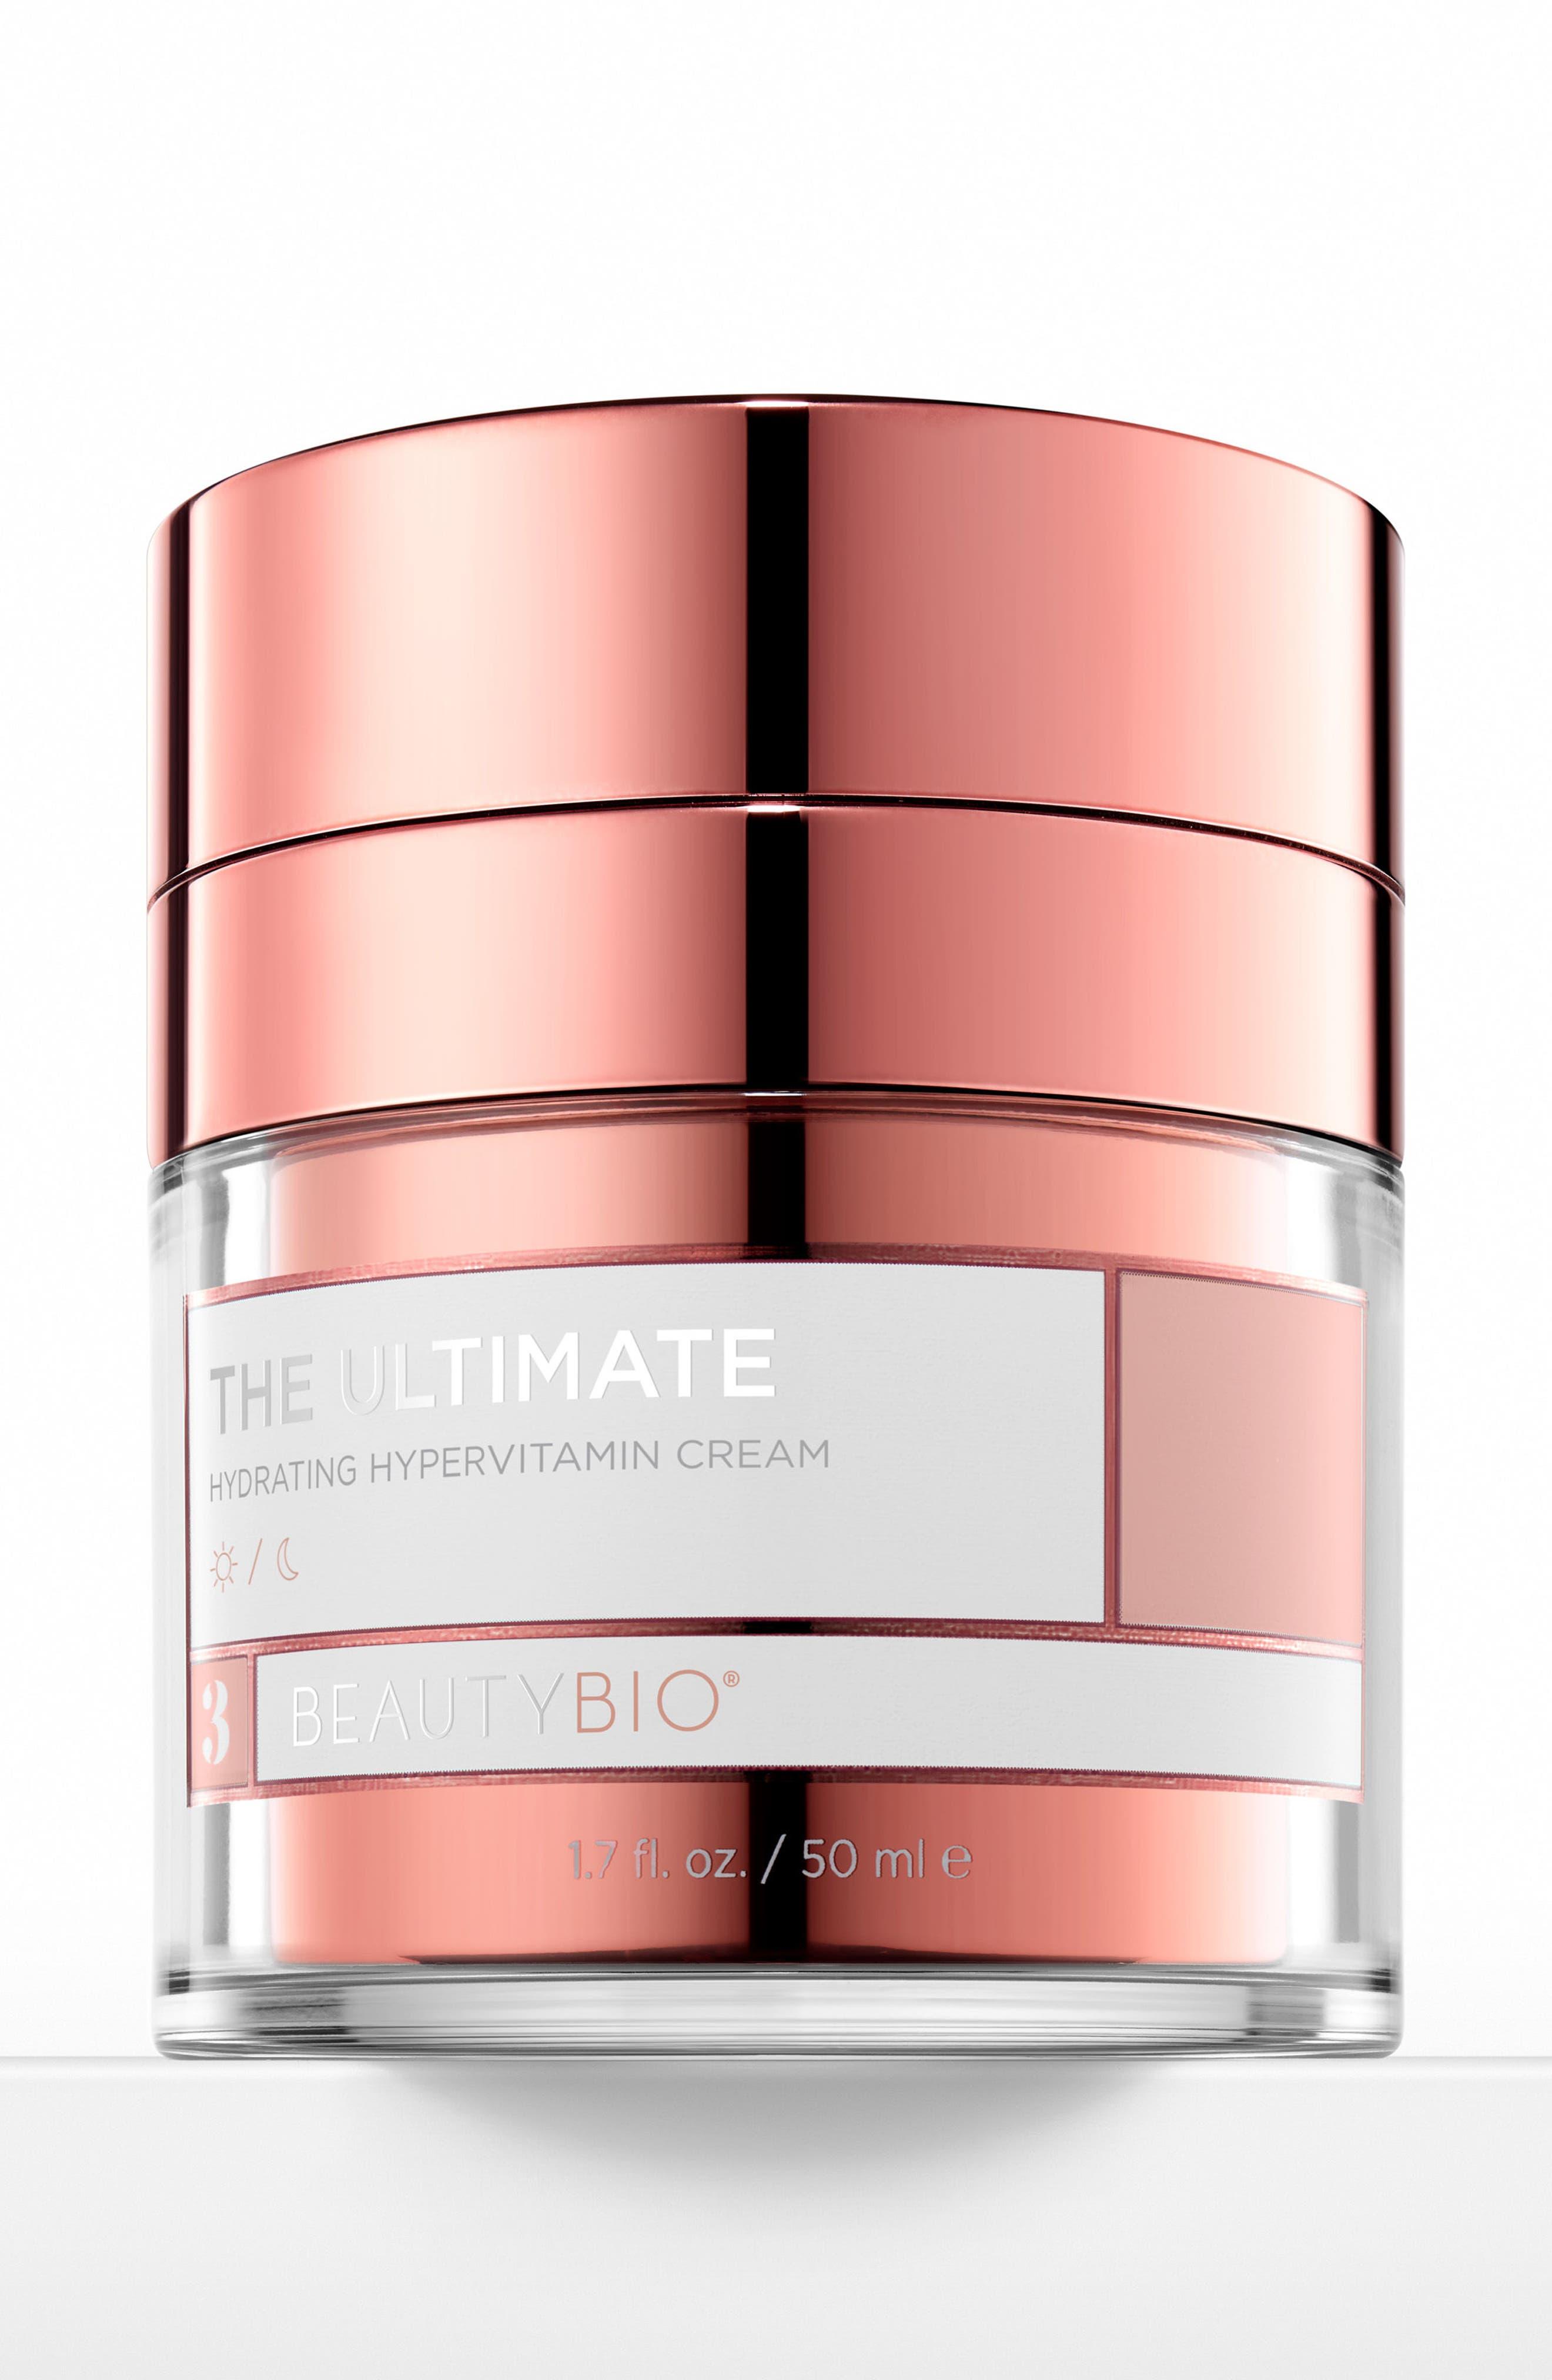 BEAUTY BIOSCIENCE The Ultimate Hydrating Hypervitamin Cream